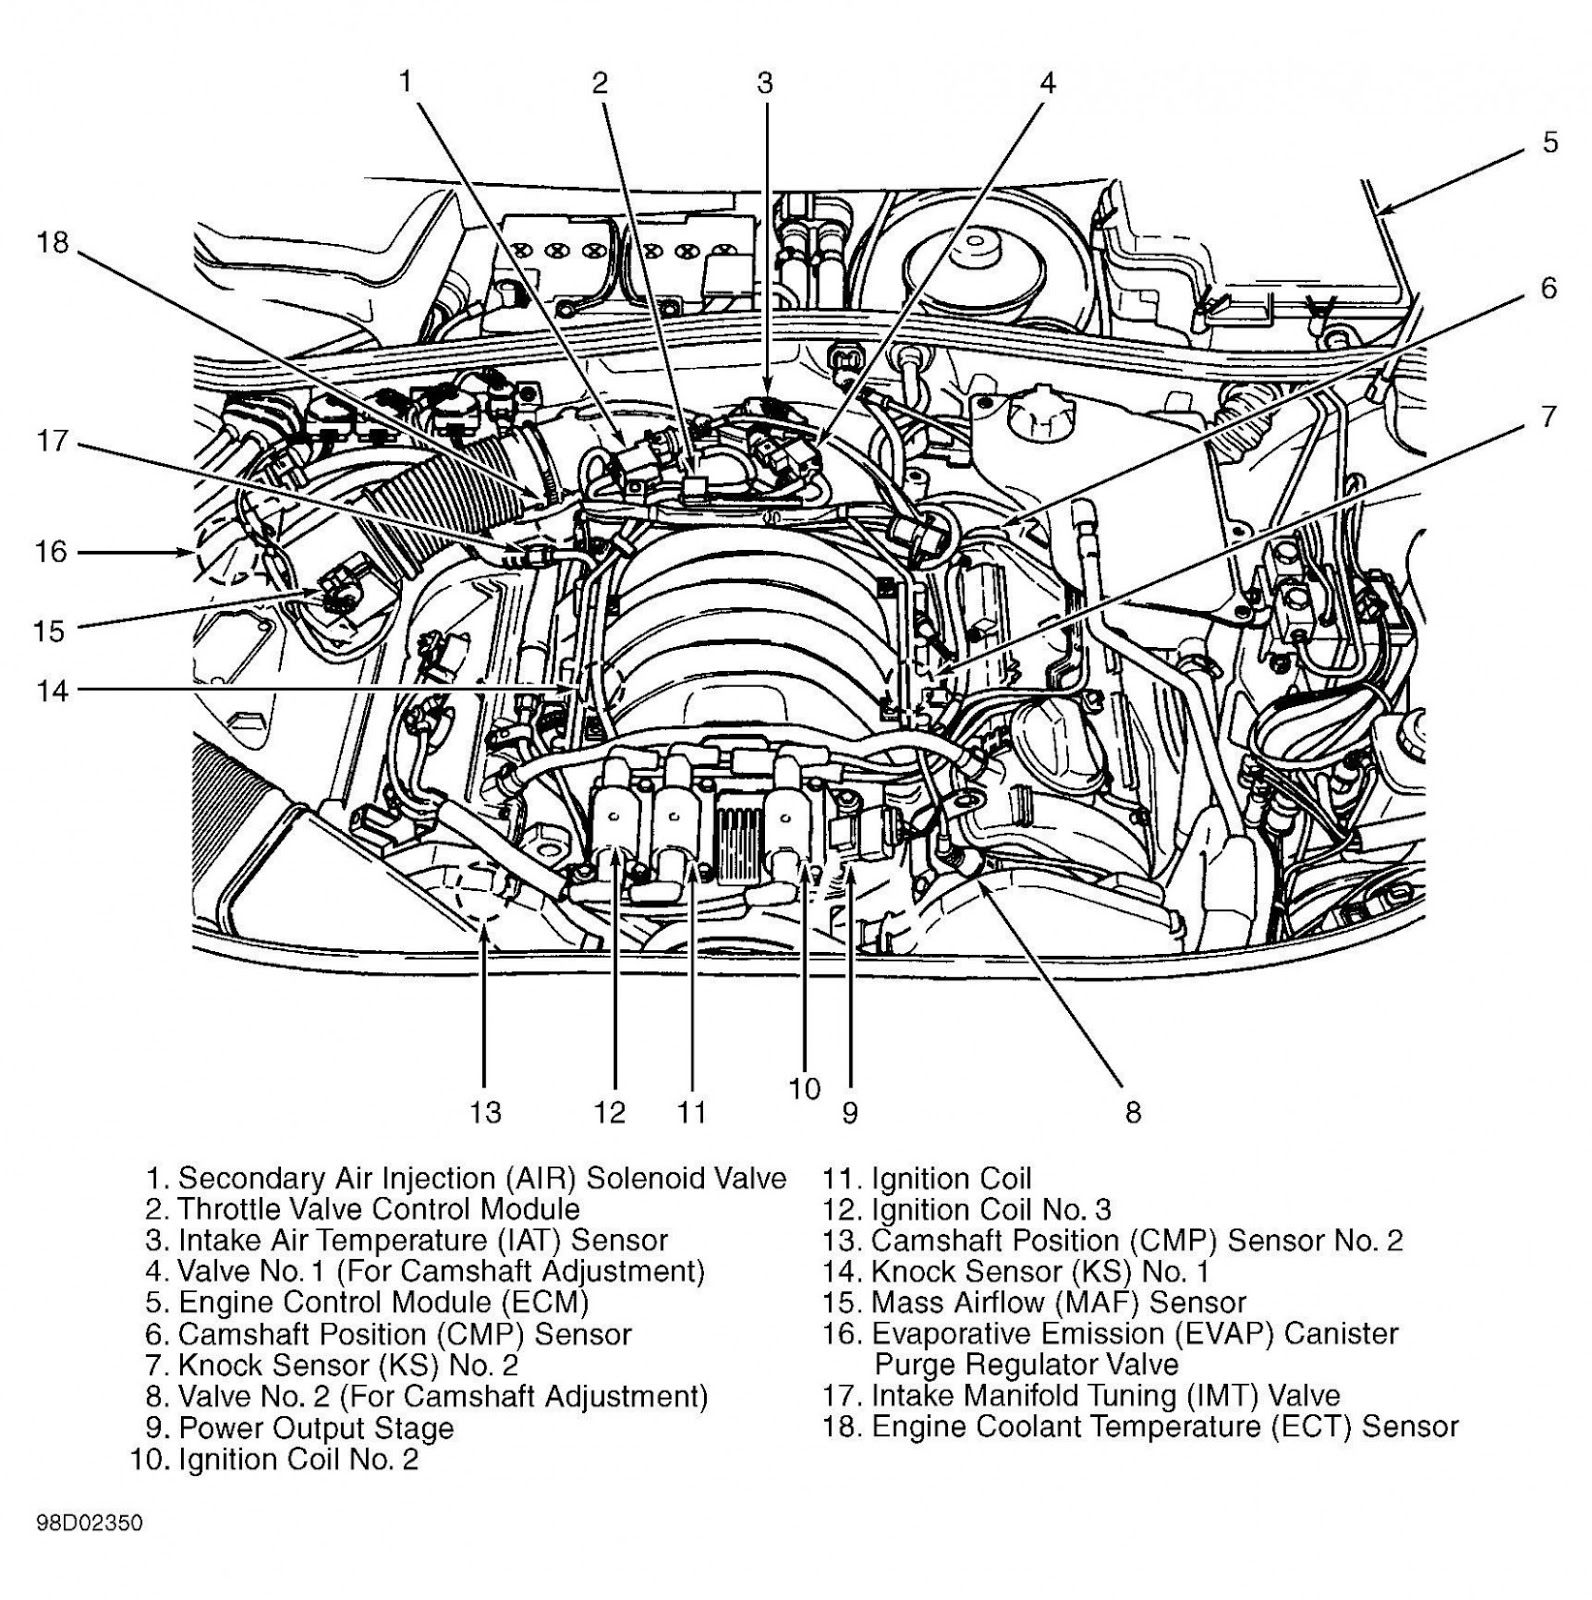 Diagram Wiring Diagram Jetta A2 Espa Ol Gratis Full